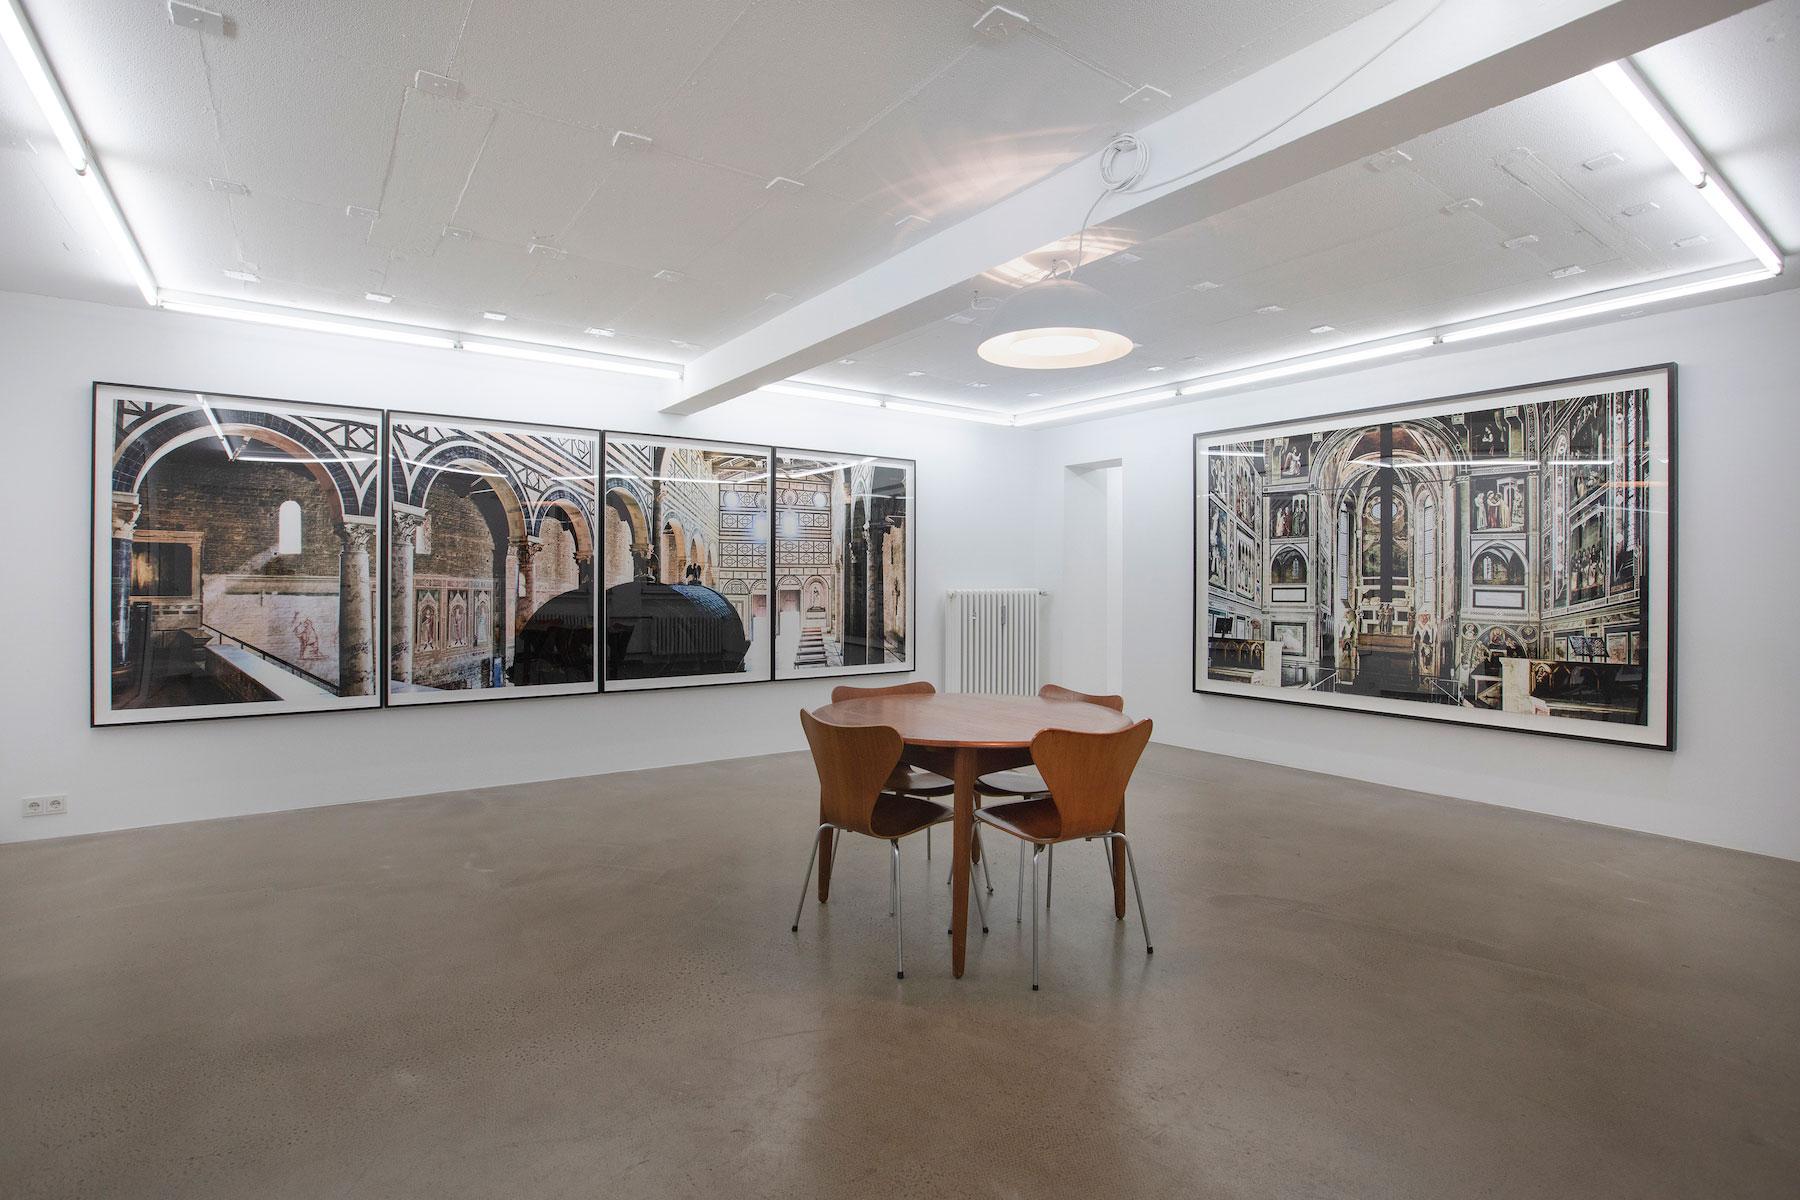 sacred-places_2019_Kolehmaien_Ola_installation-view_01